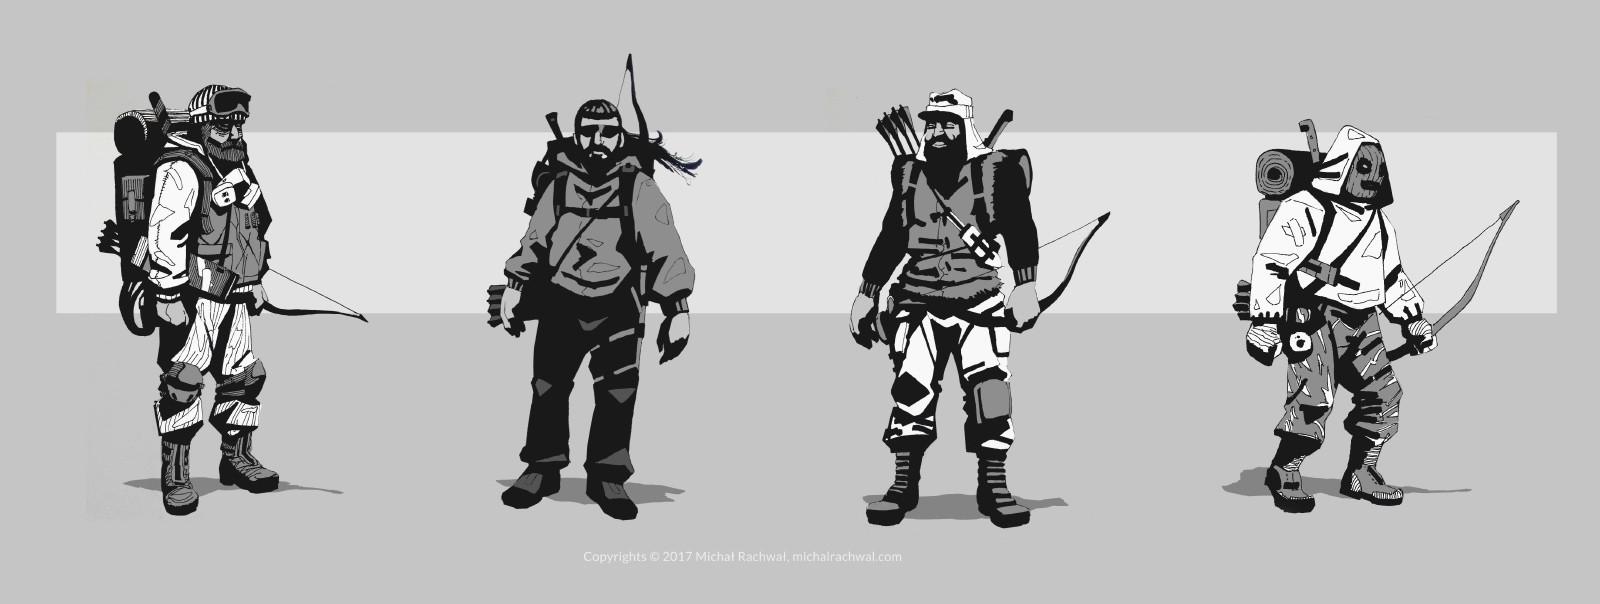 Michal rachwal michal rachwal hunter sketches2